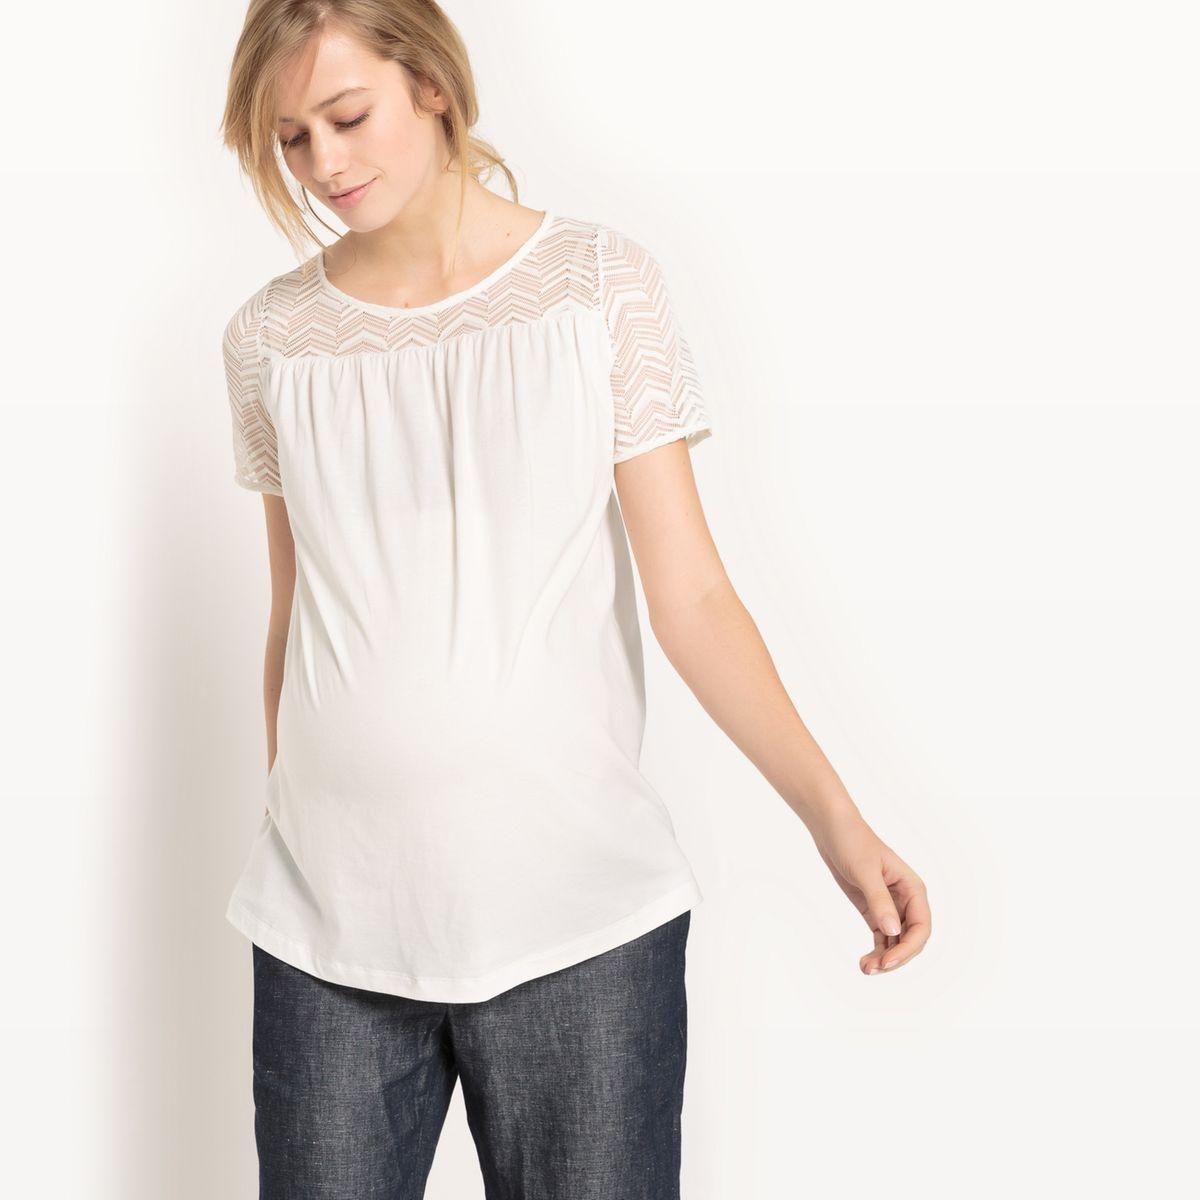 Tee shirt col rond de grossesse